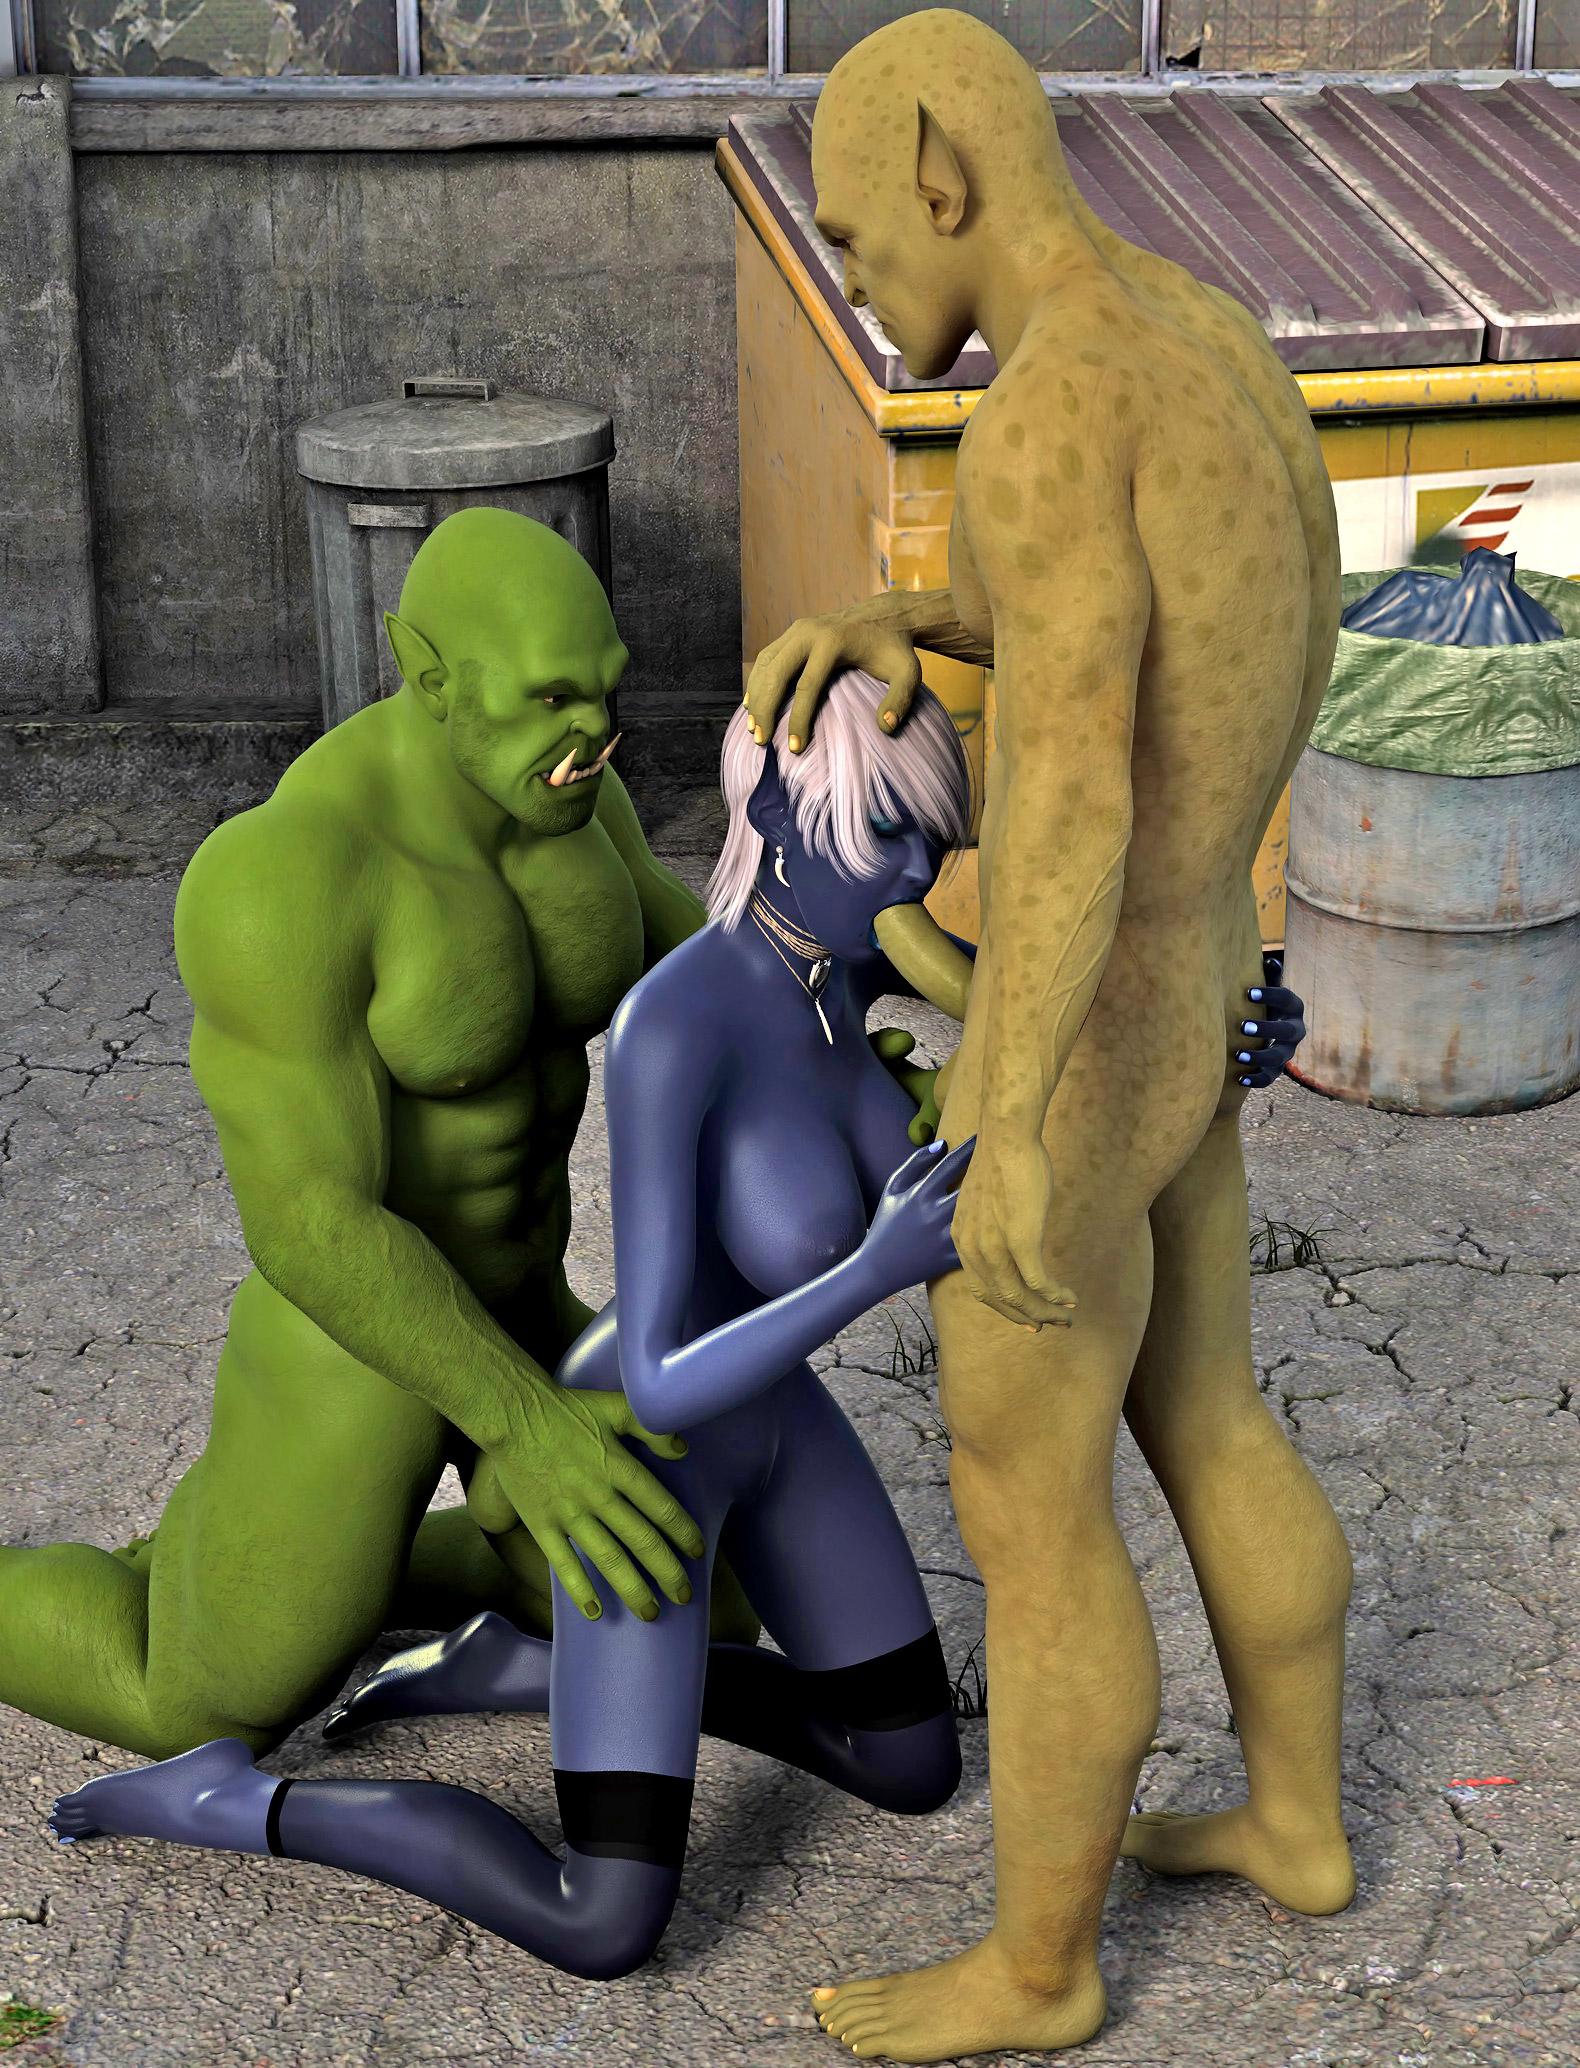 Trolls monsters demons sex xxx movies